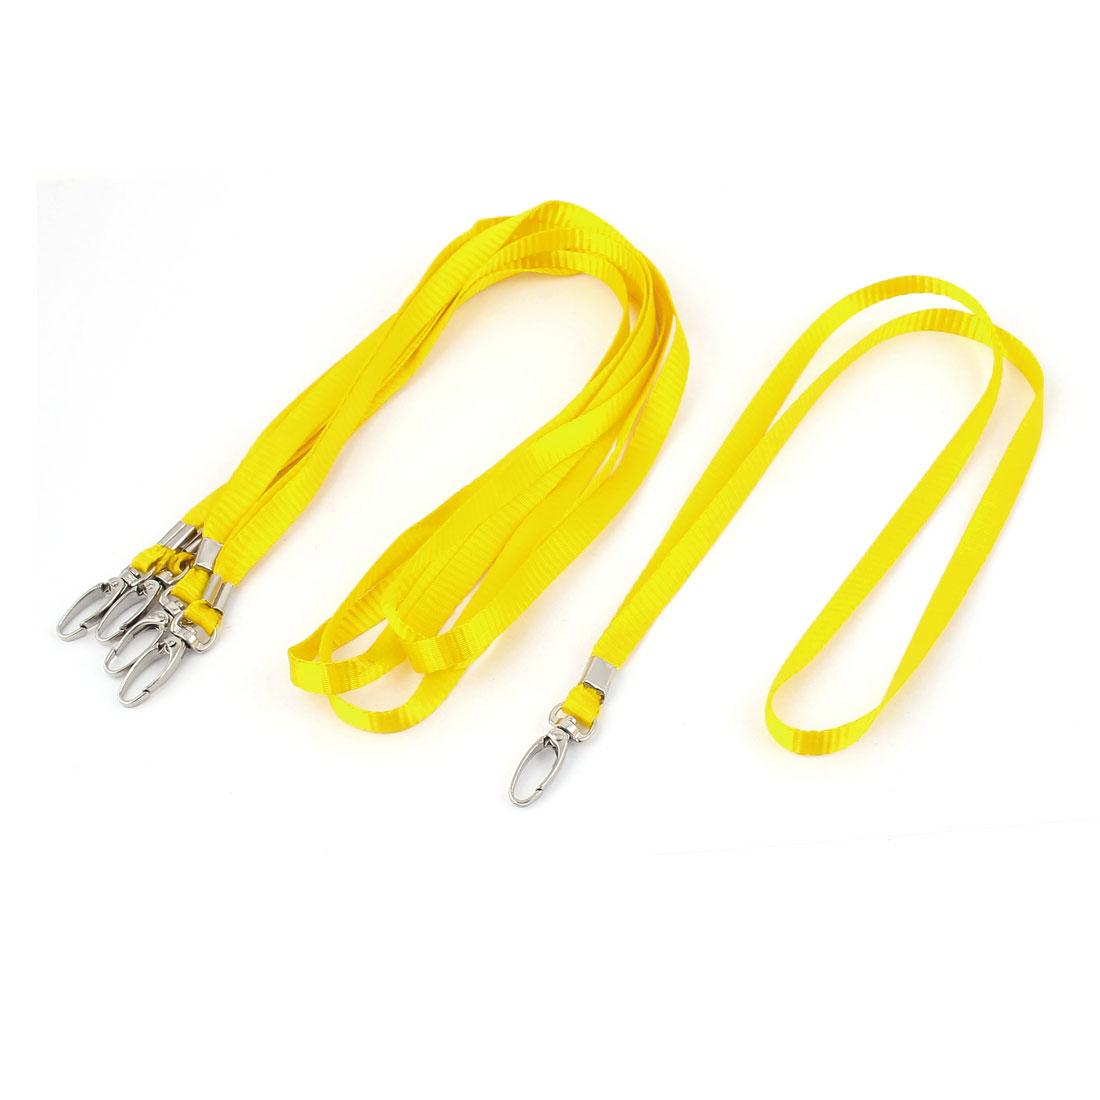 ID Card Tag Pass Badge Holder Metal Hook Clip Neck Strap Lanyard Yellow 5pcs